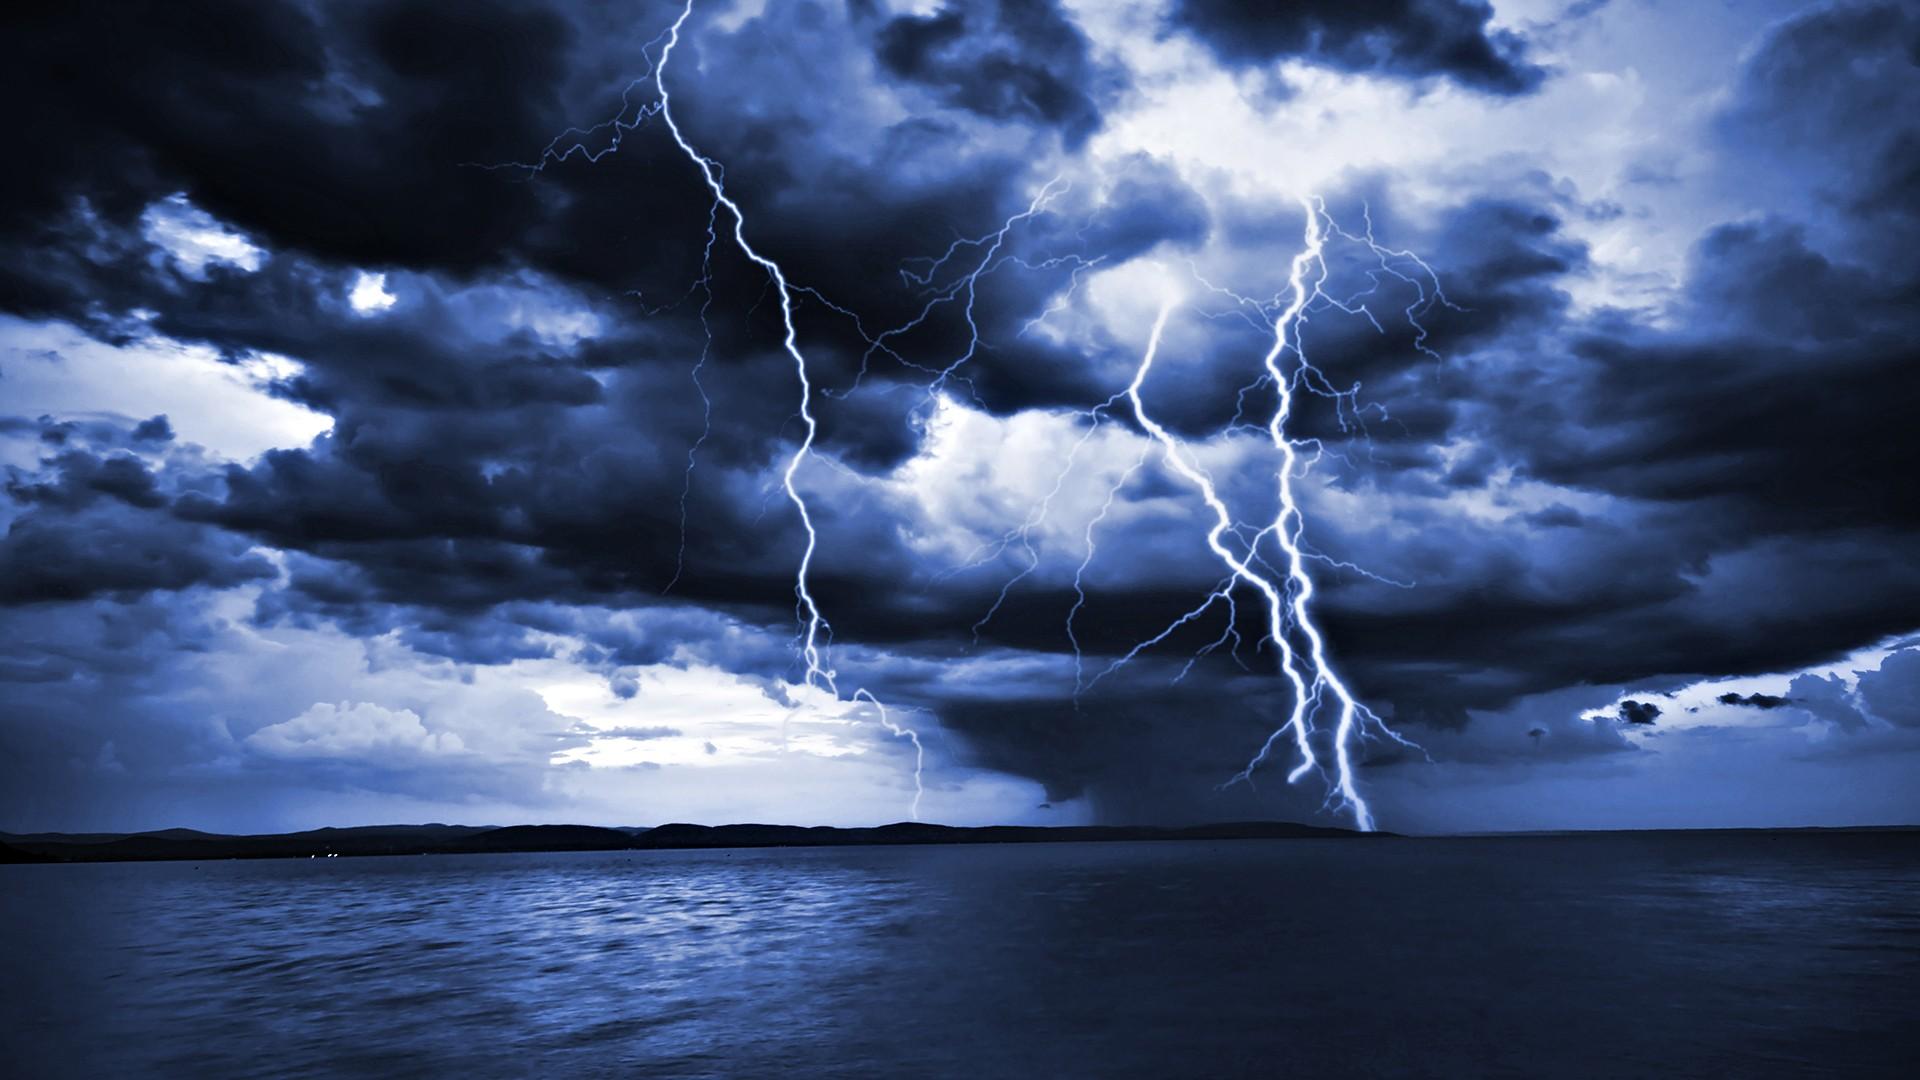 Free Download Storm High Definition Wallpaper Wallpaper High